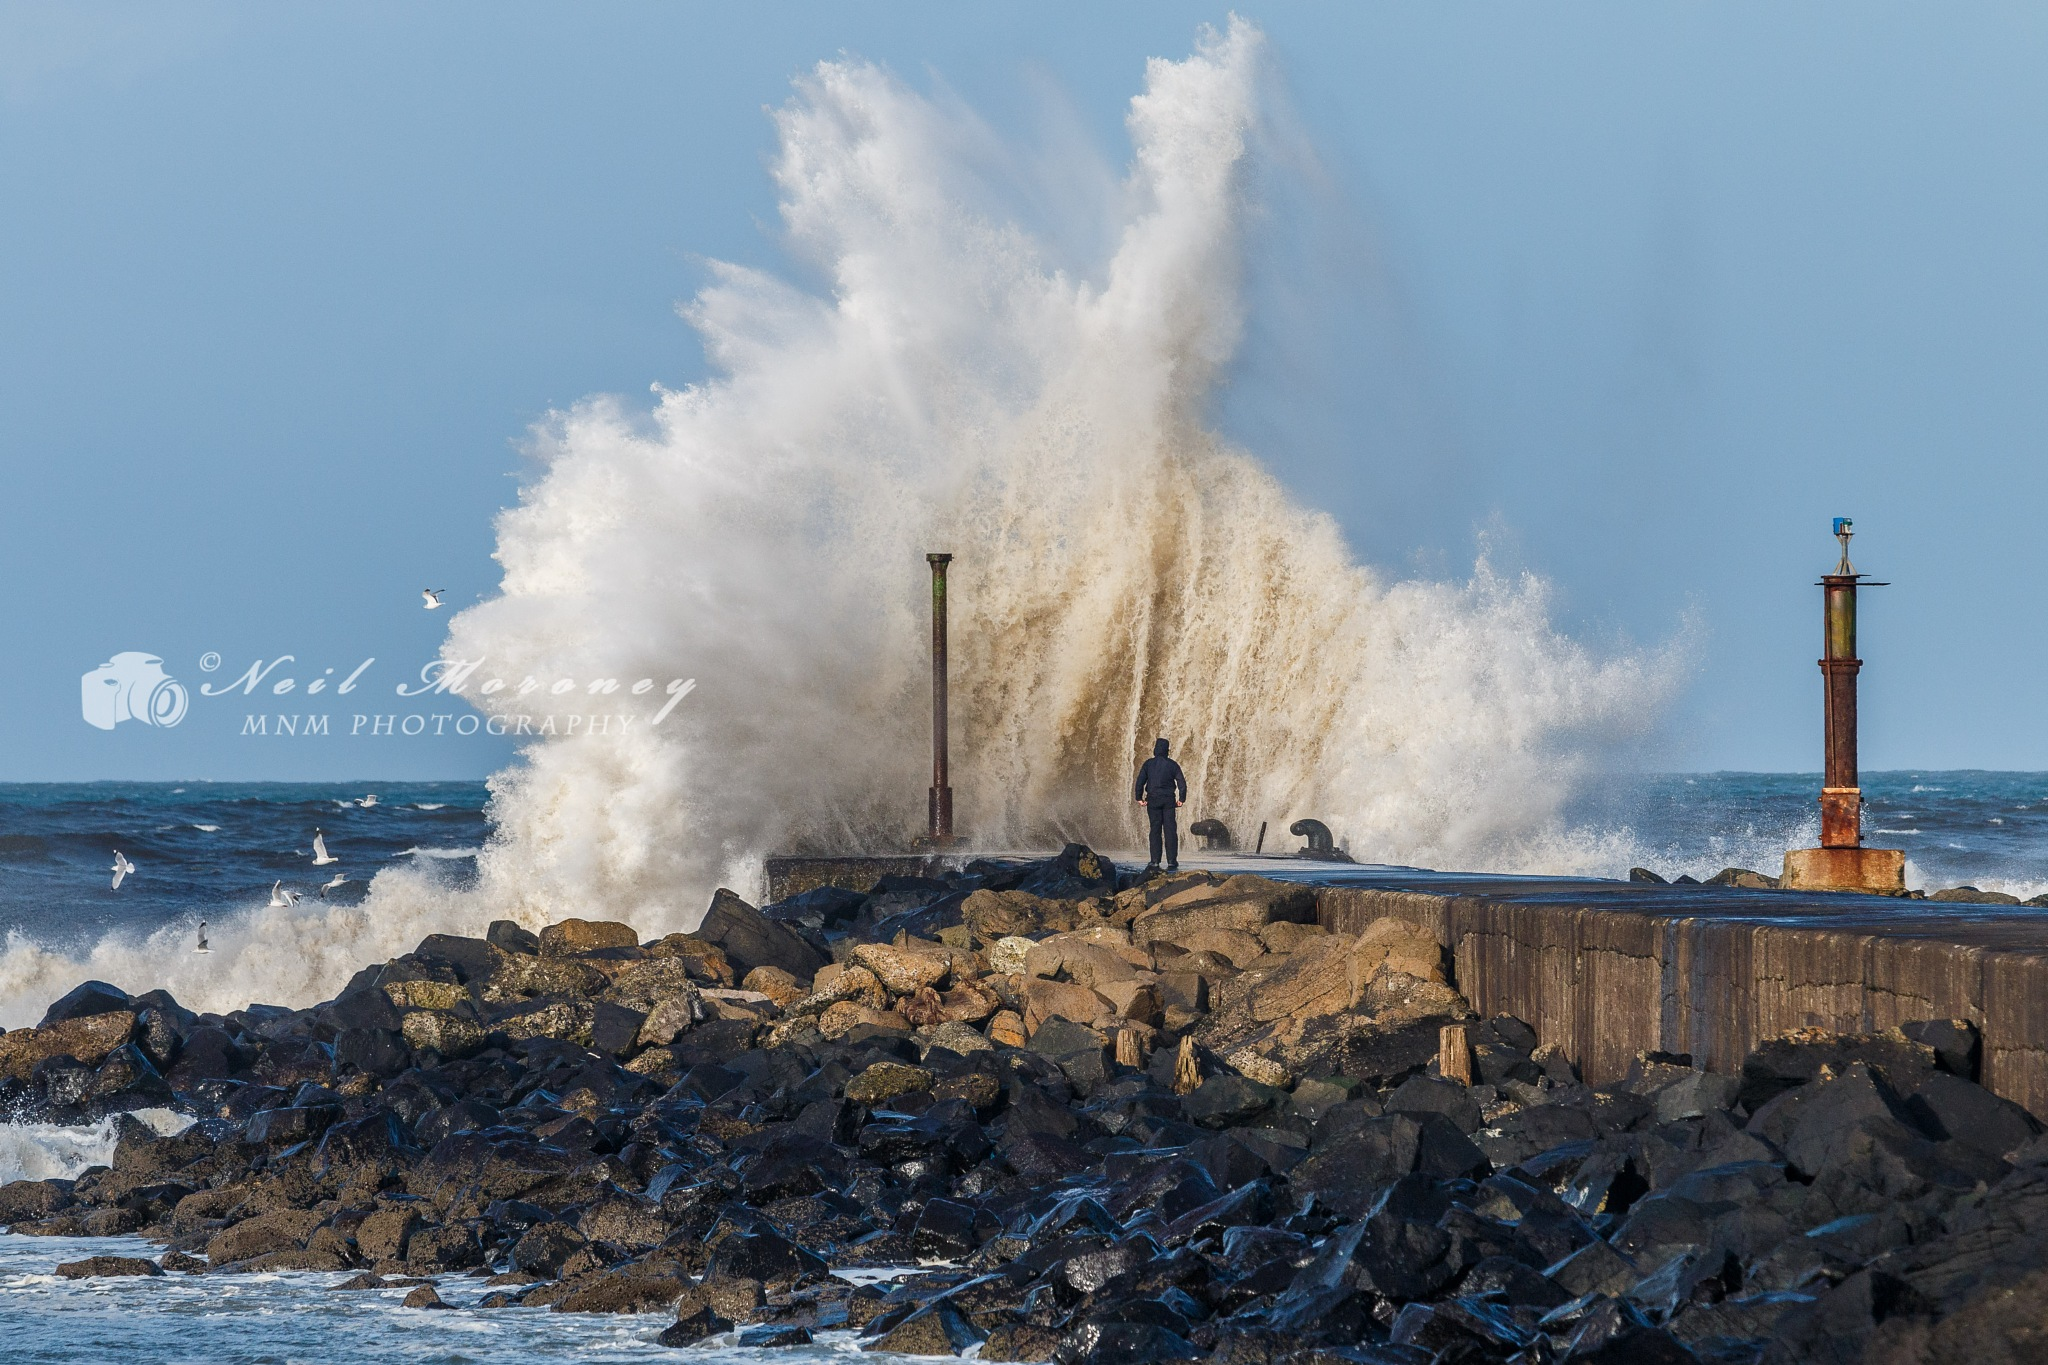 Wave Watcher by Neil Moroney